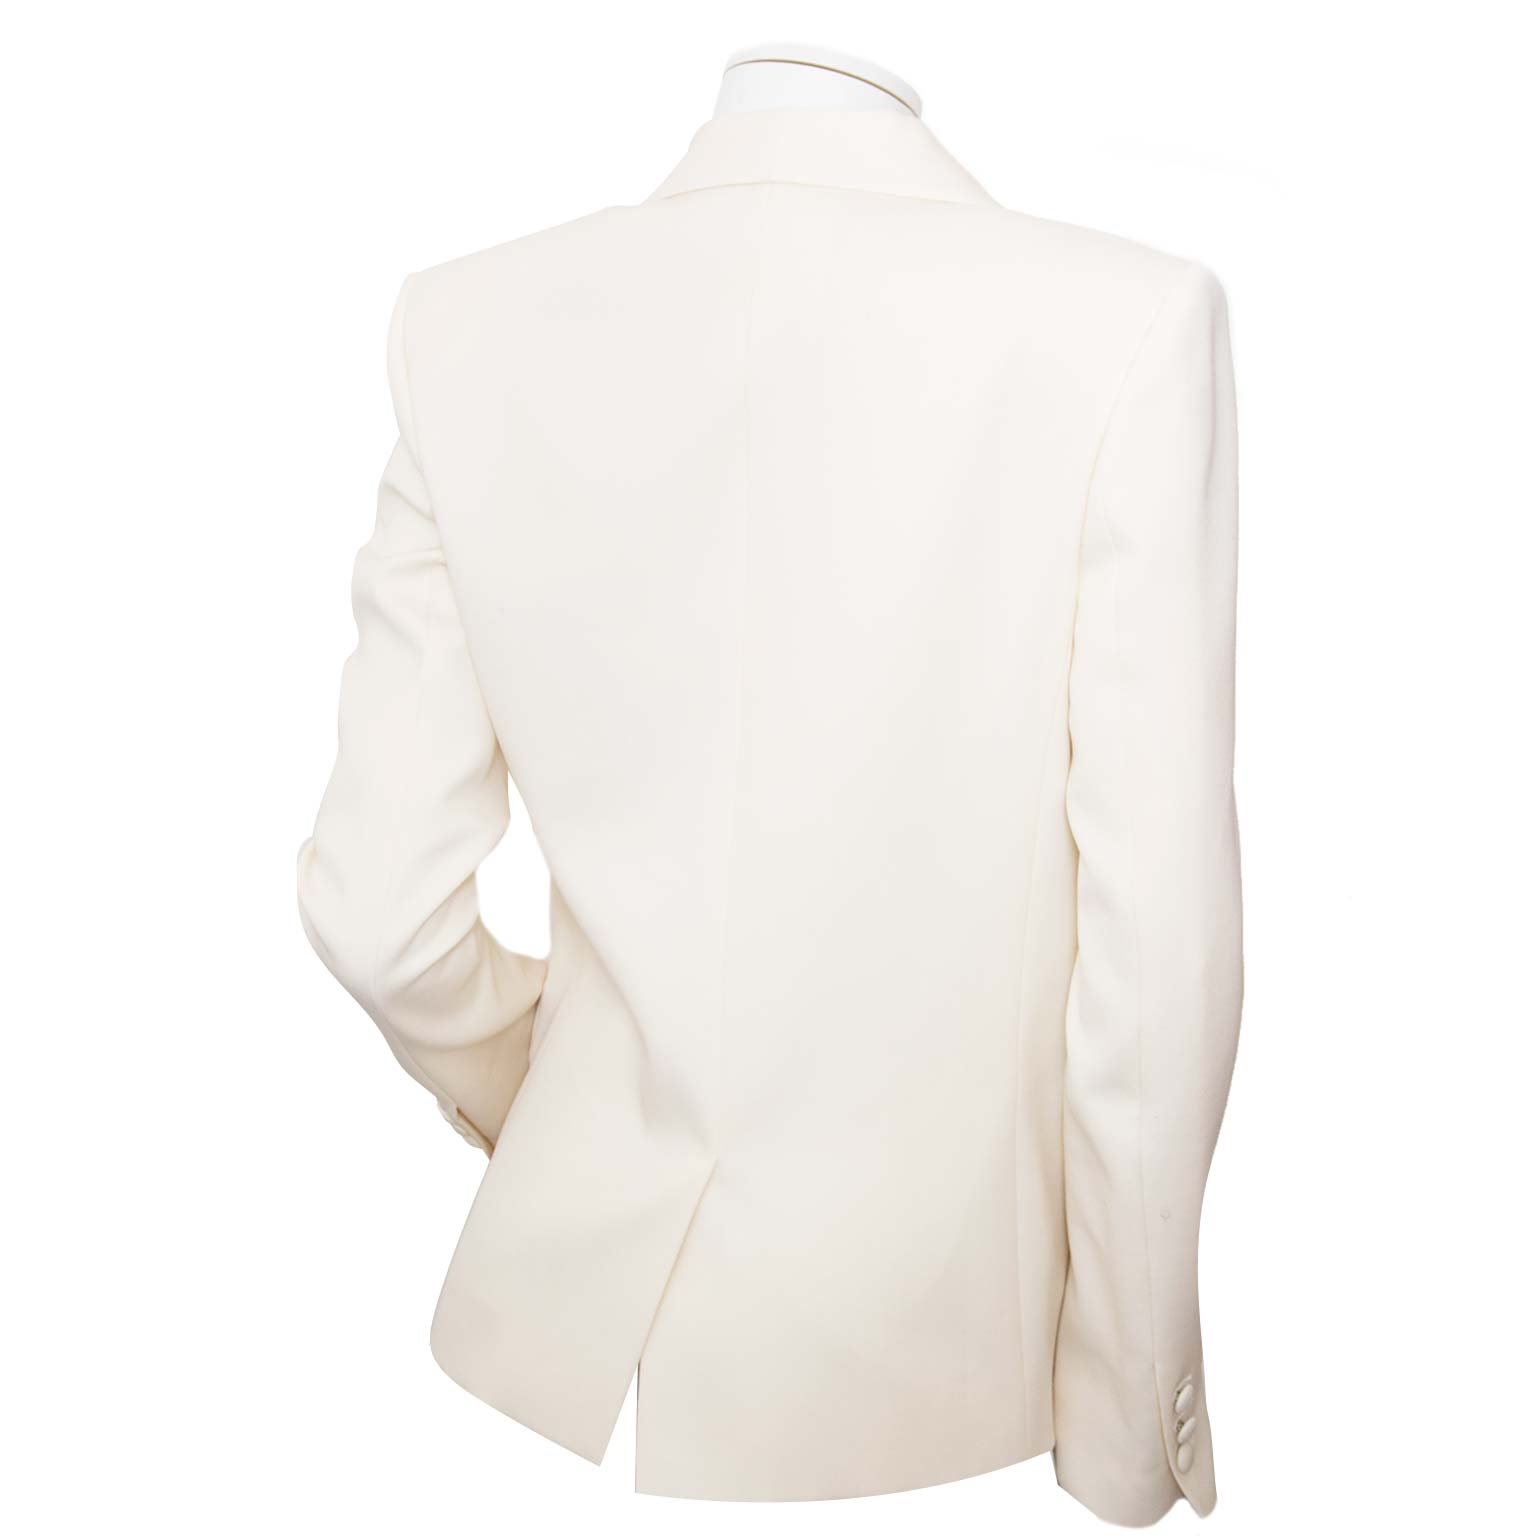 achetez Balmain White Blazer - 36  sur labellov en payez secure on ligne